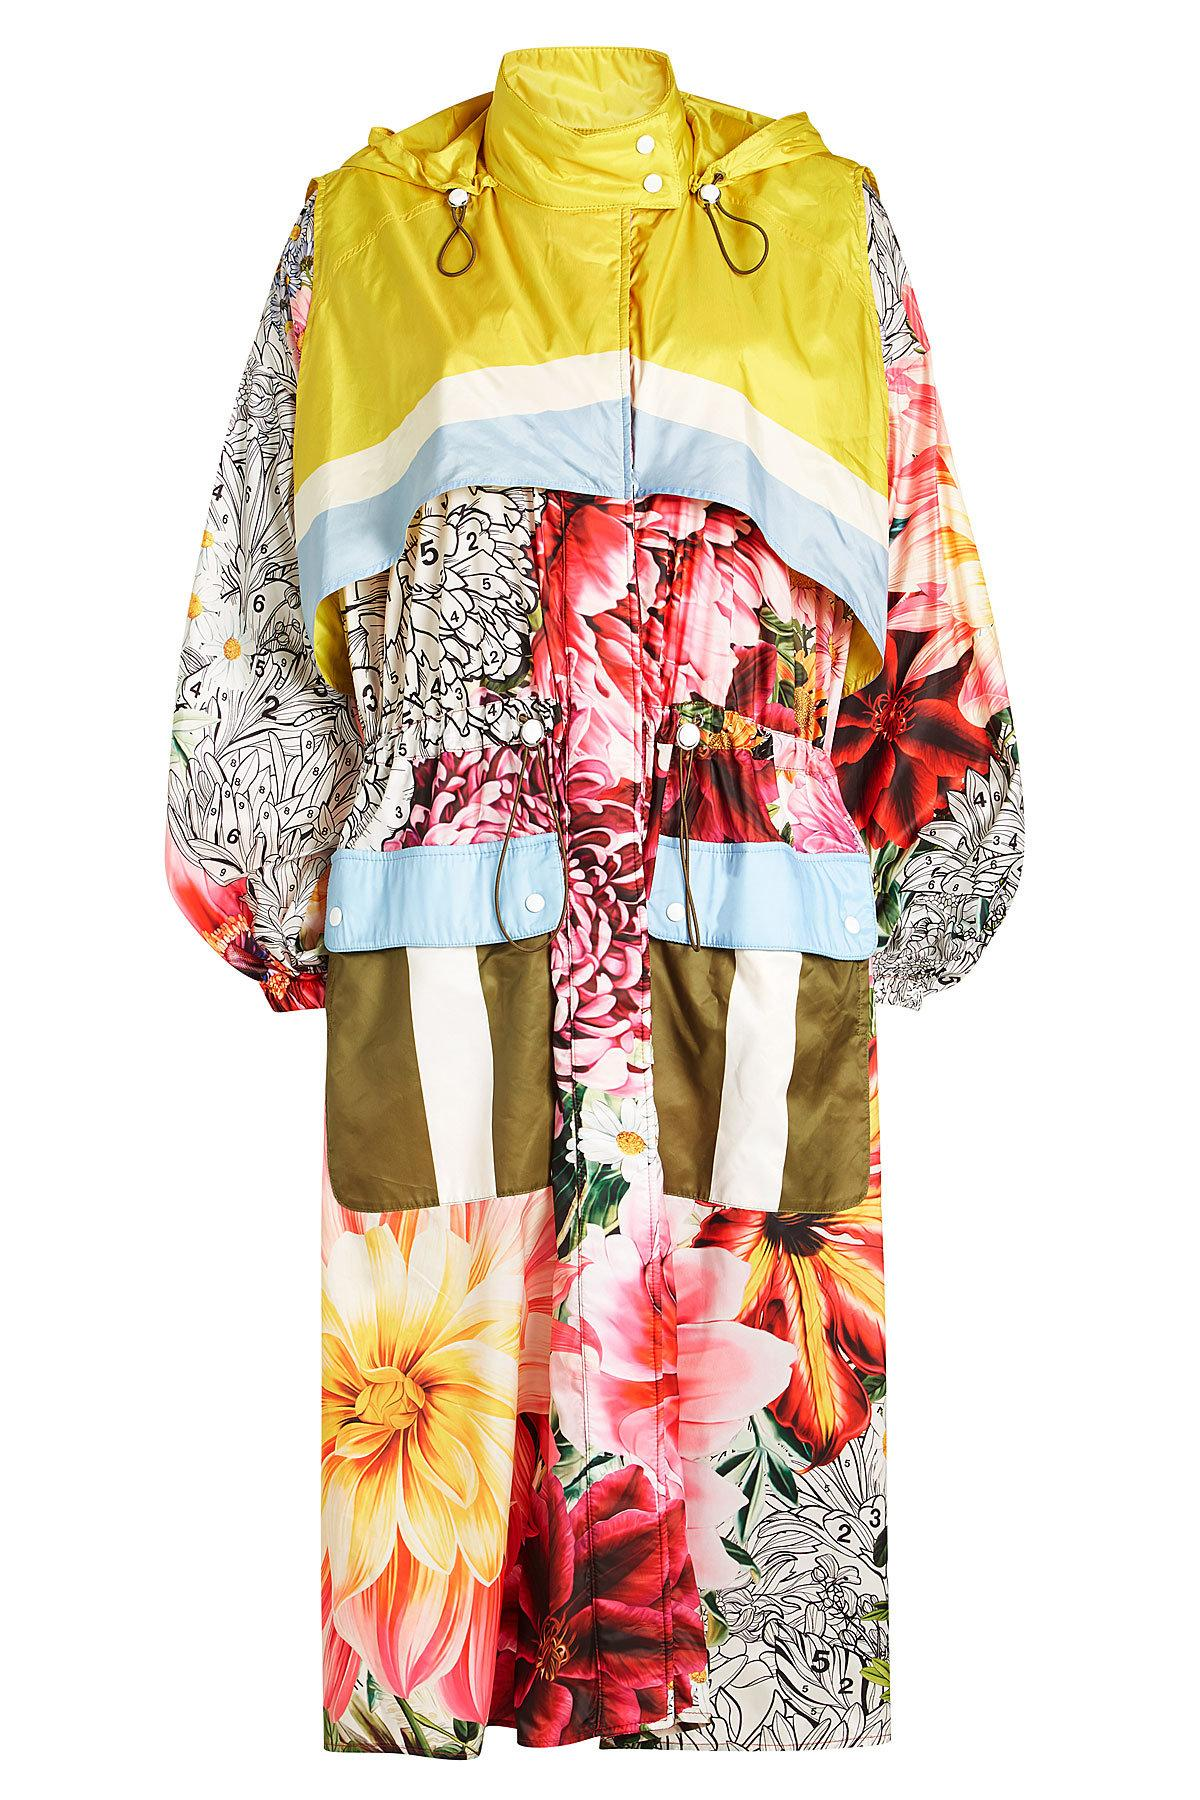 Mary Katrantzou Printed Coat In Multicolored